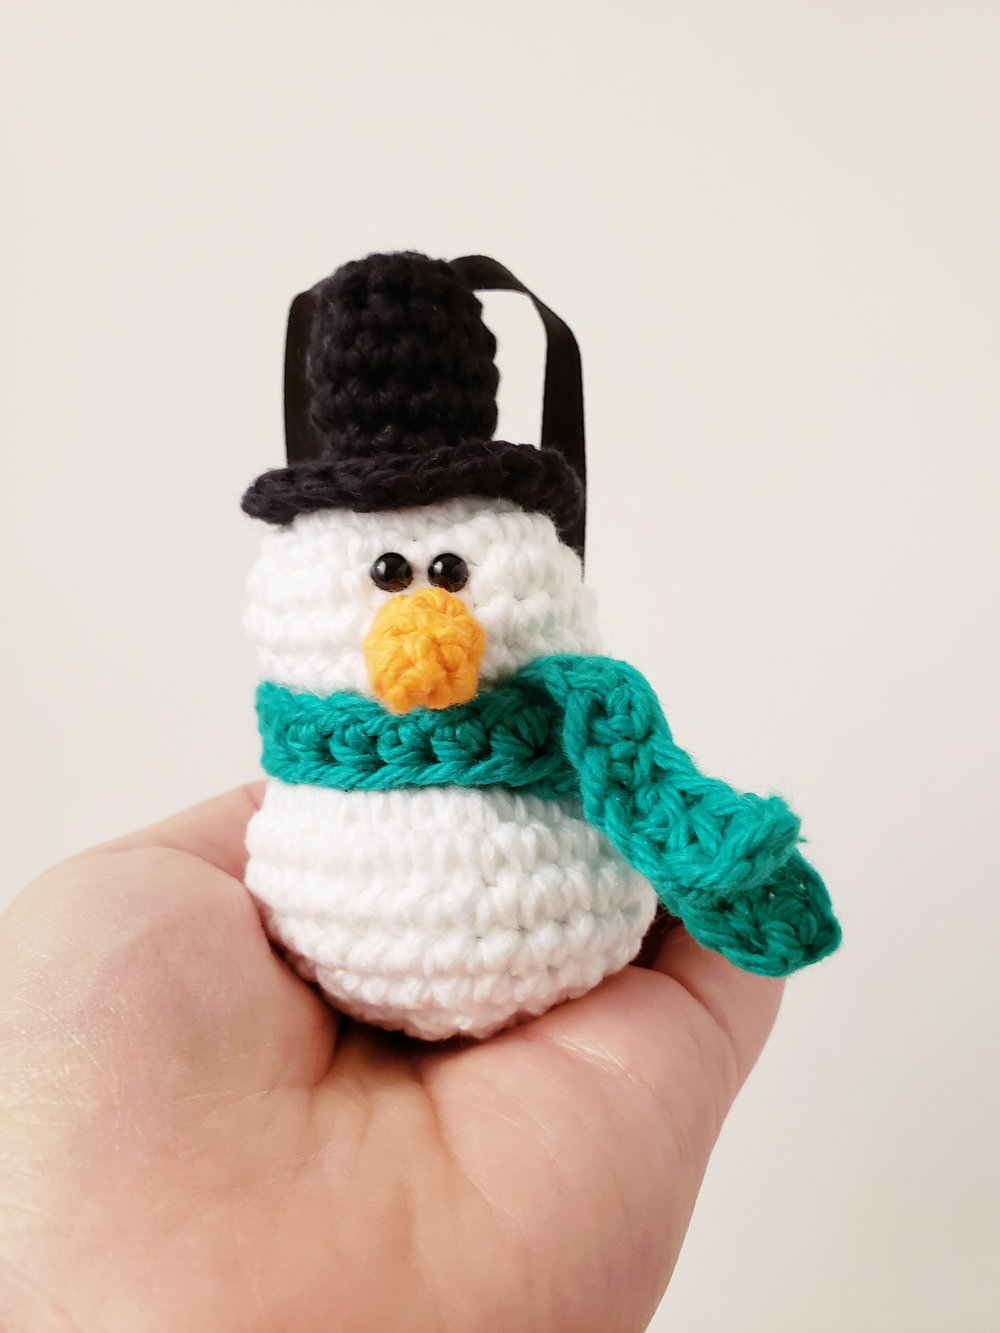 Snowman Ornament Crochet Pattern The Pudgy Rabbit